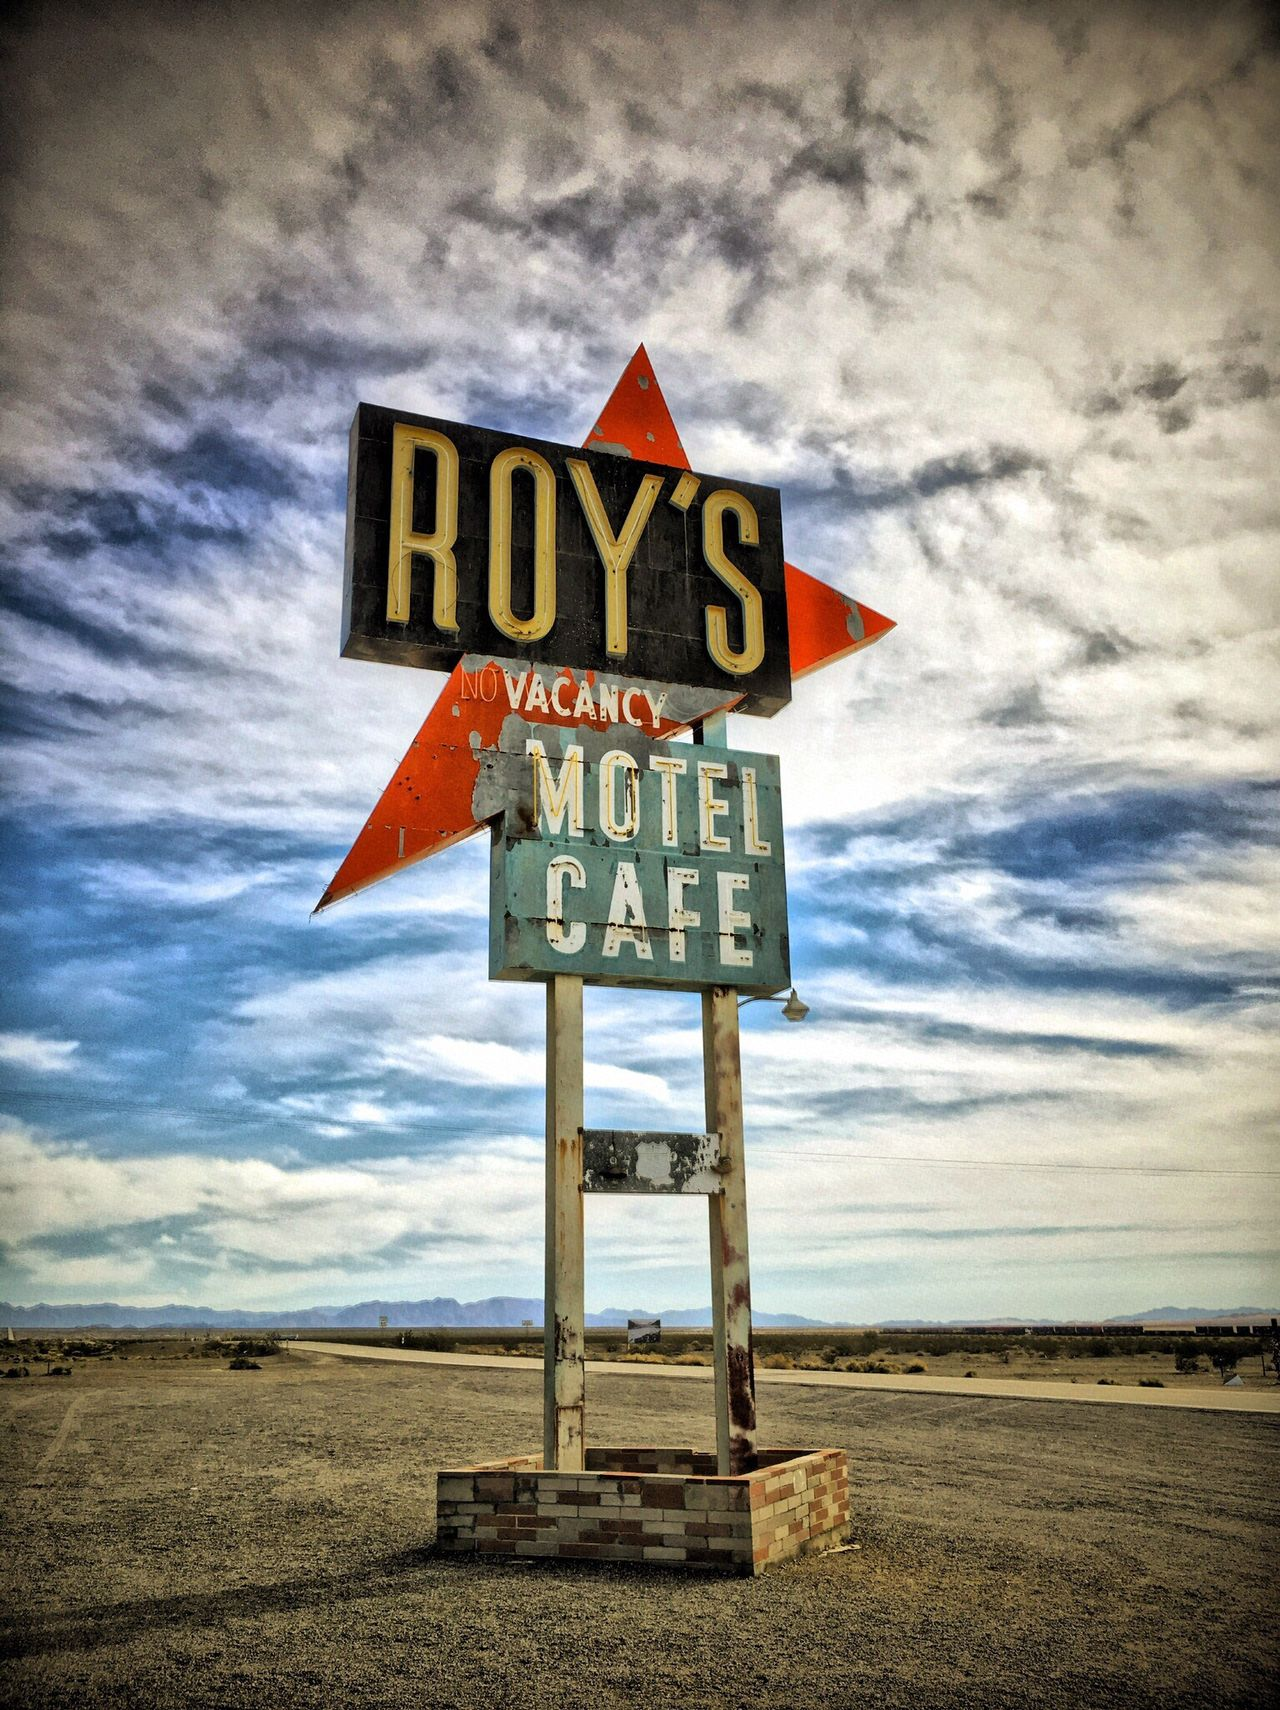 Roy's Cafe Cloud - Sky Road Sign Roys Cafe In Amboy Route 66 Diner Roadside America Roadside Diner Abandoned Places Highway Backroads